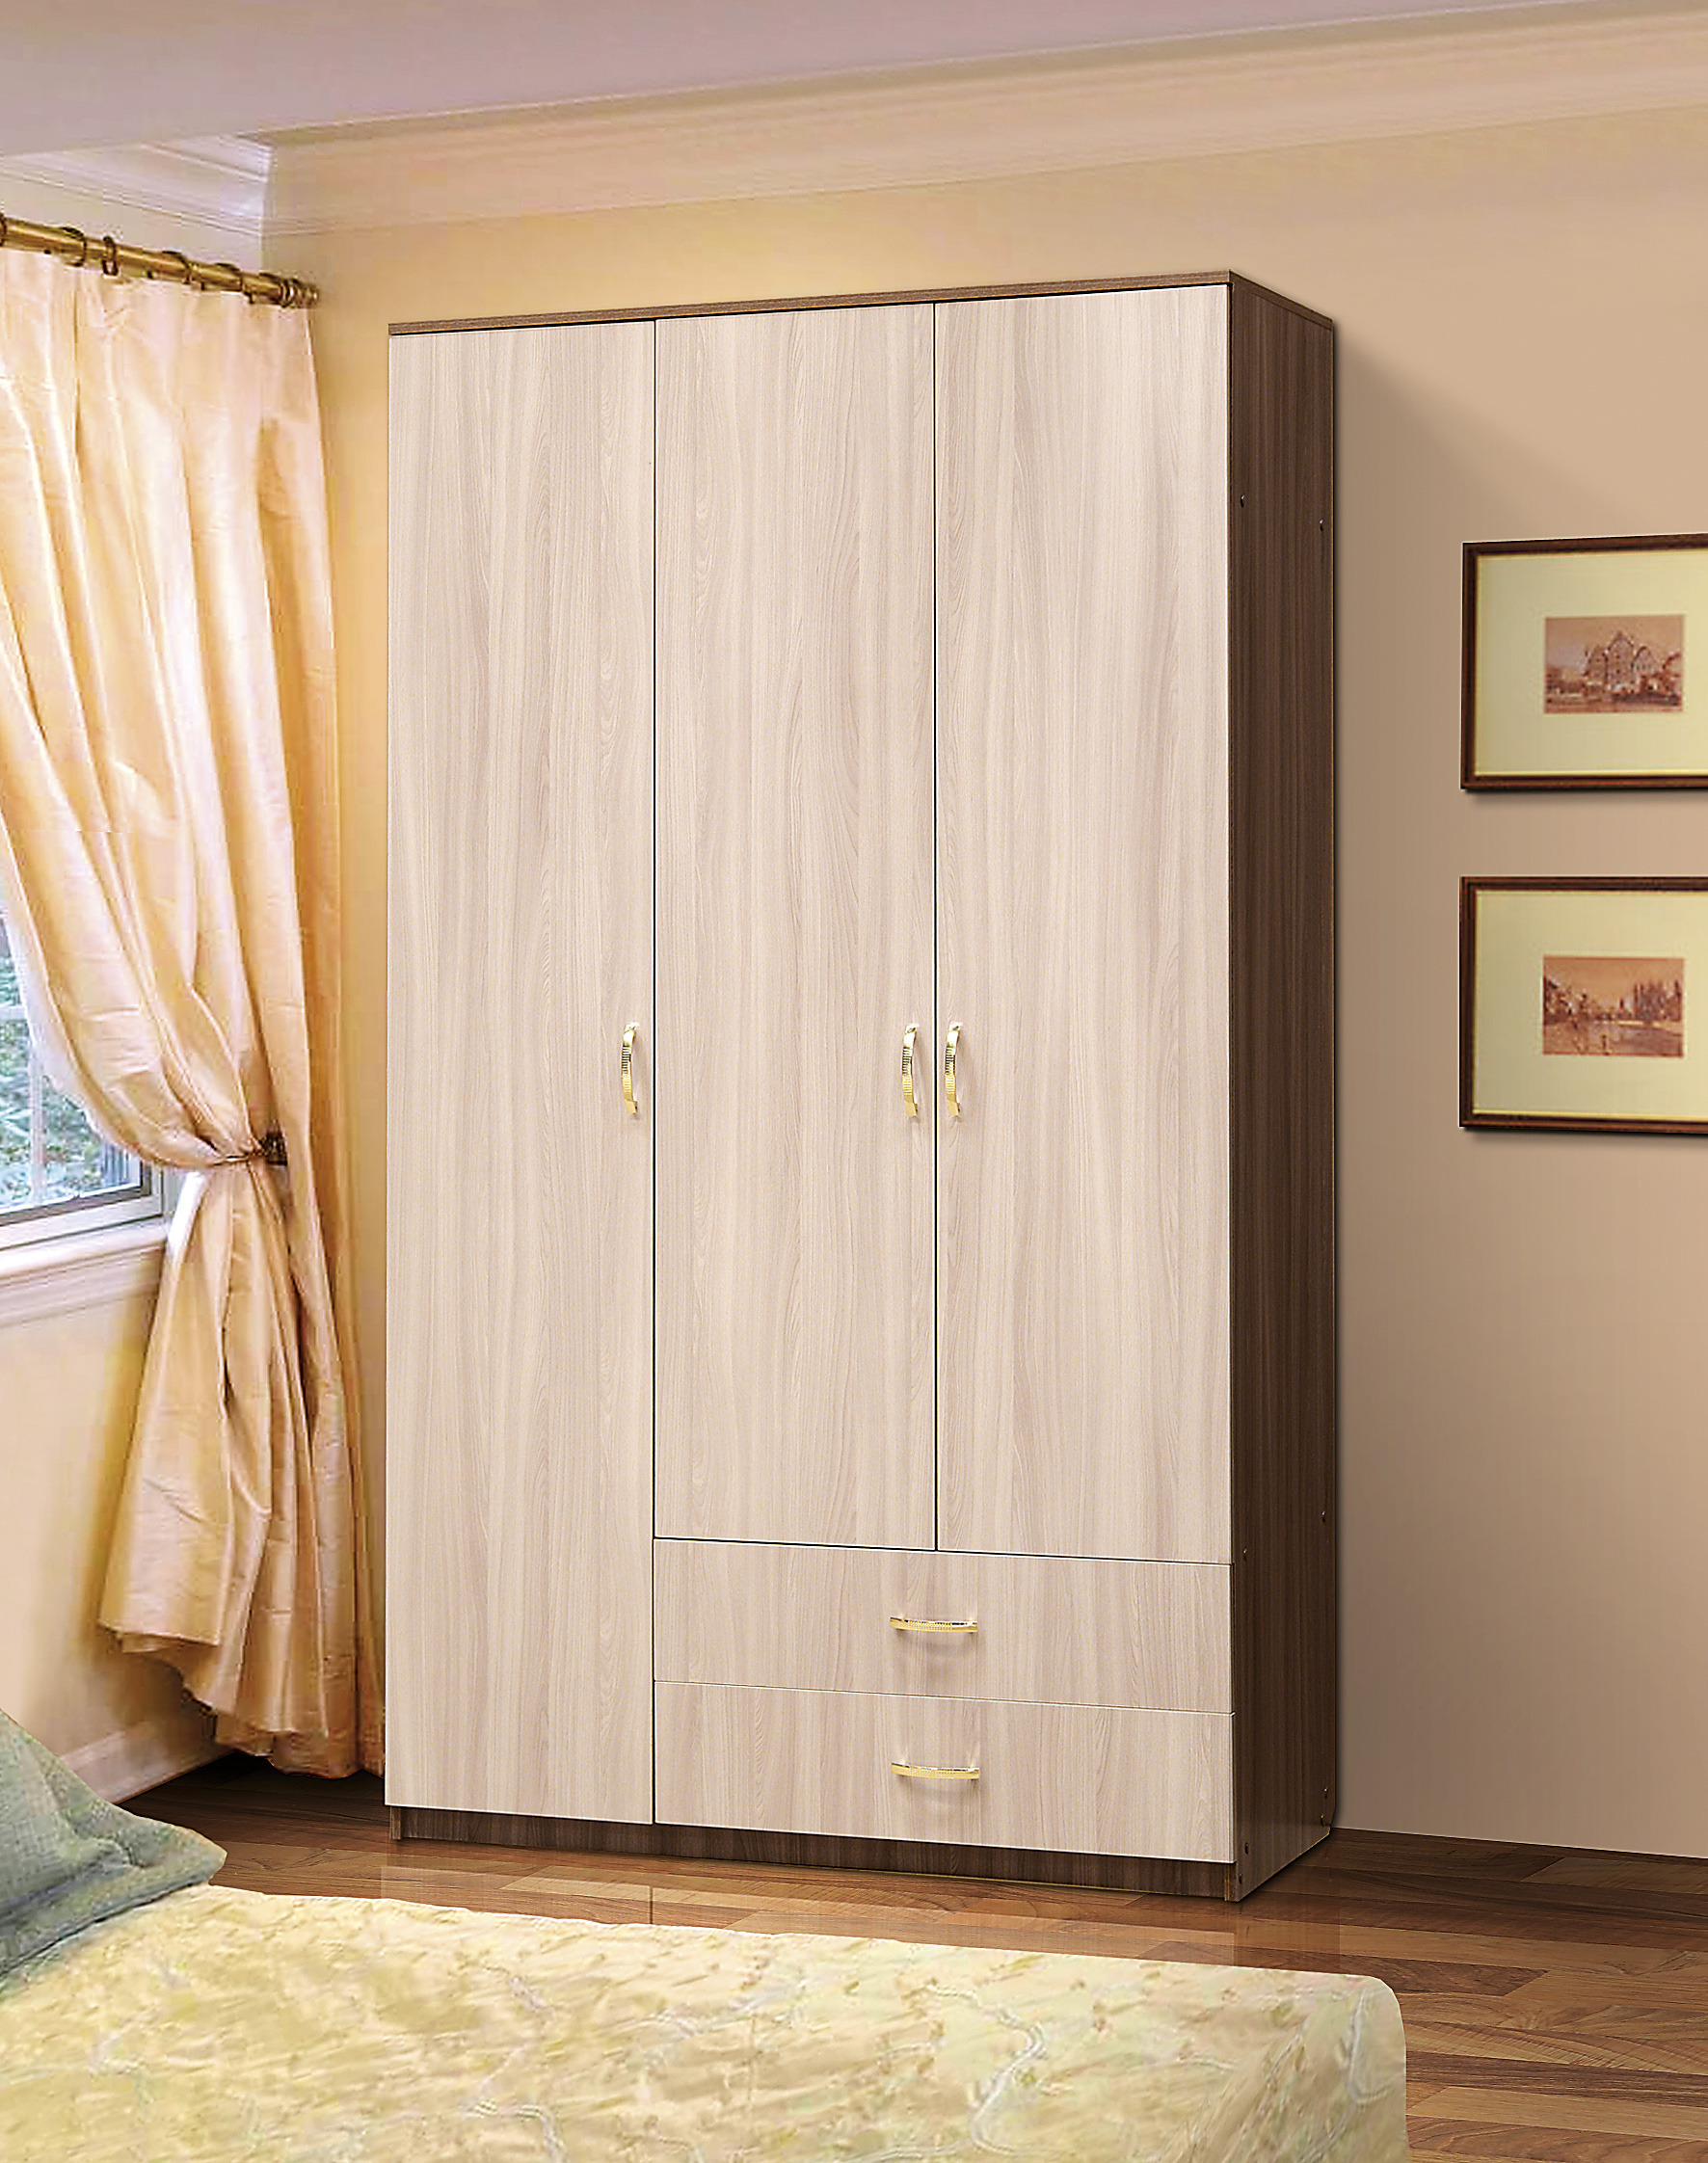 Шкаф 3-х с 2-мя ящиками  ЛДСПШкафы<br><br><br>Длина мм: 1200<br>Высота мм: 2116<br>Глубина мм: 520